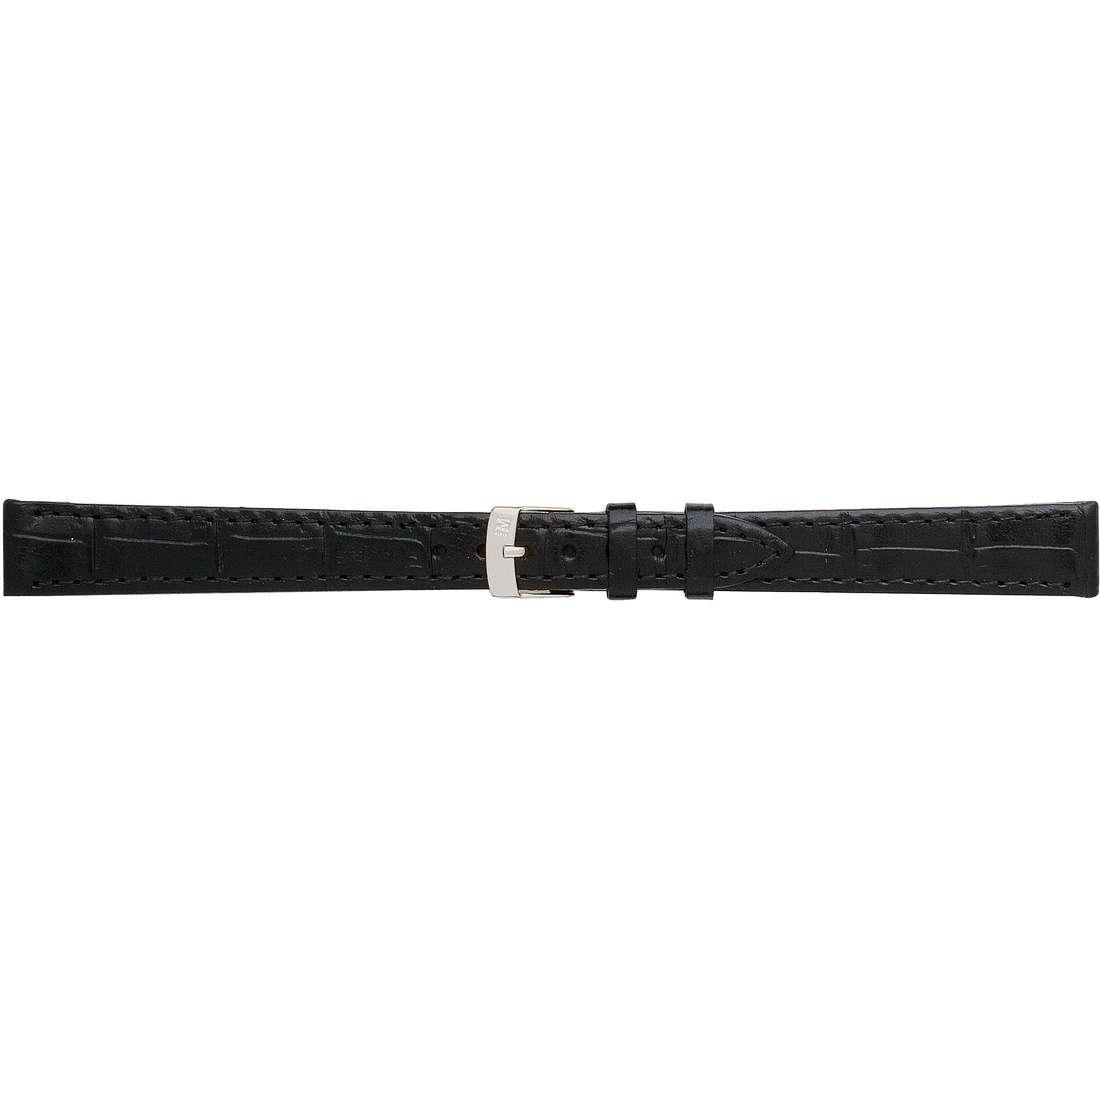 montre bande de montres unisex Morellato I Lunghi A01Y2524656019CR16